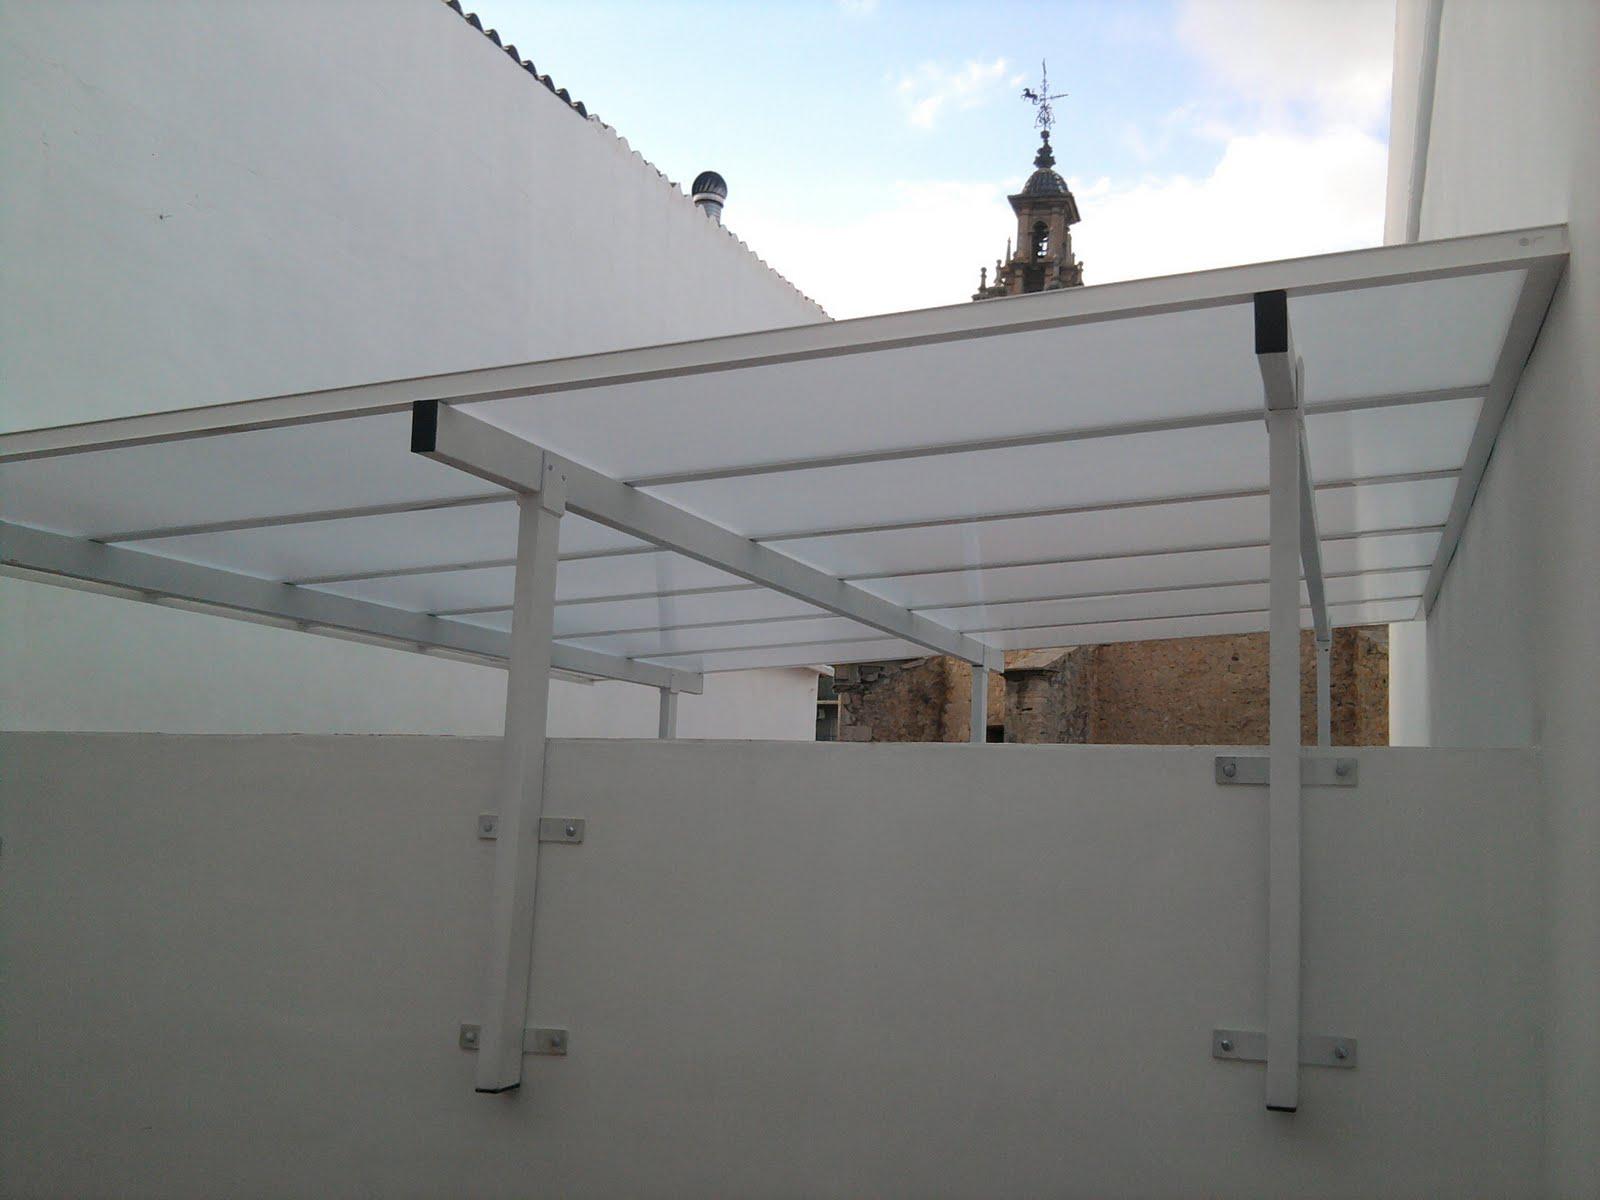 Cerramiento patio luces simple aluminisnacho for Patio de luces normativa